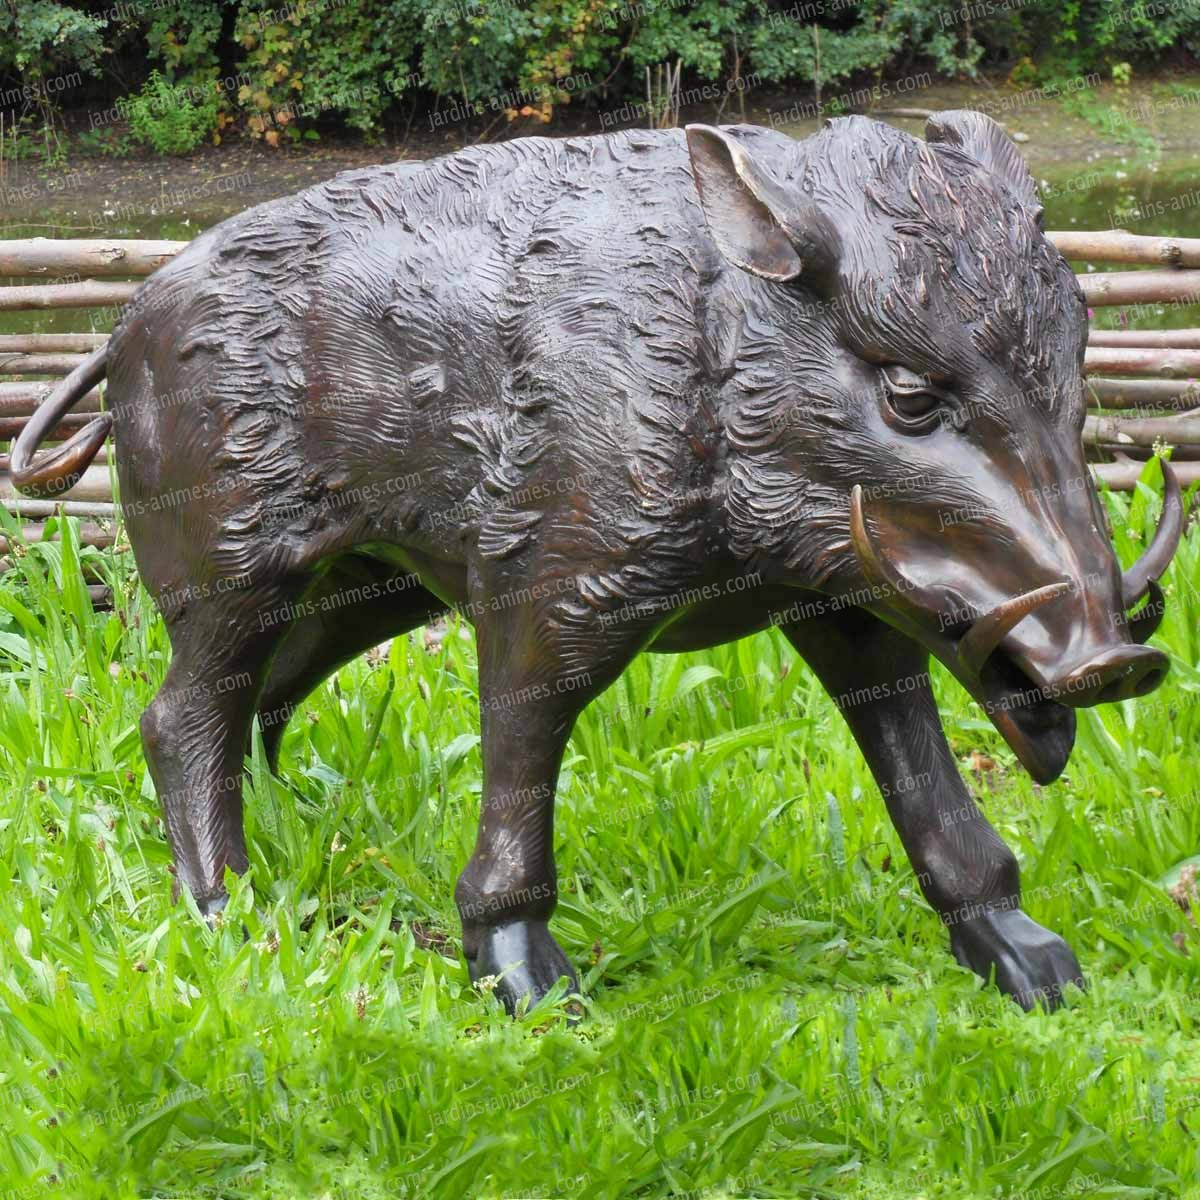 Sculpture sanglier en bronze statue animaux de jardin h 55cm figurines d coratives - Statue jardin ...